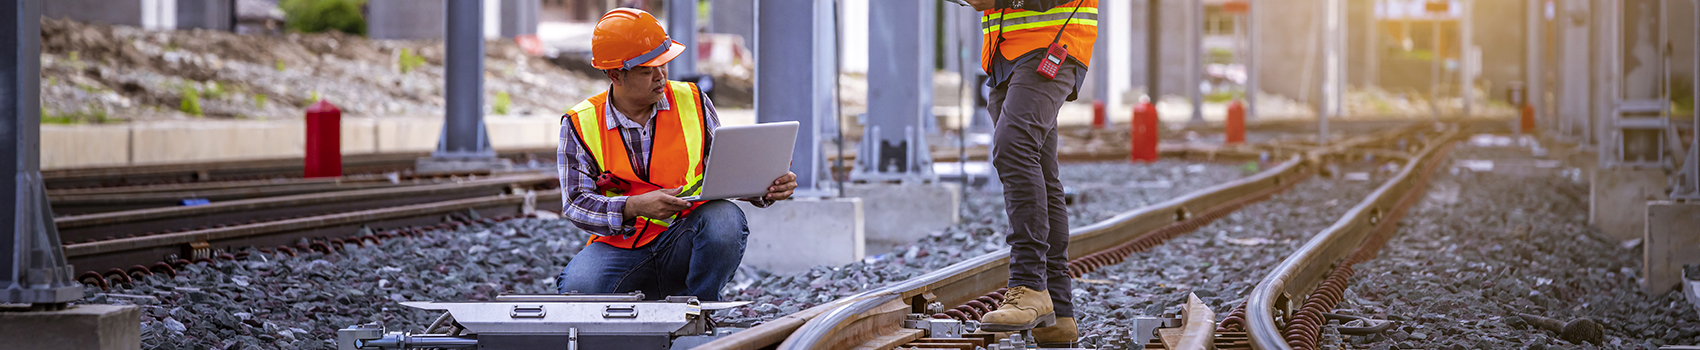 domaine infrastructures ferroviaires_1700x350